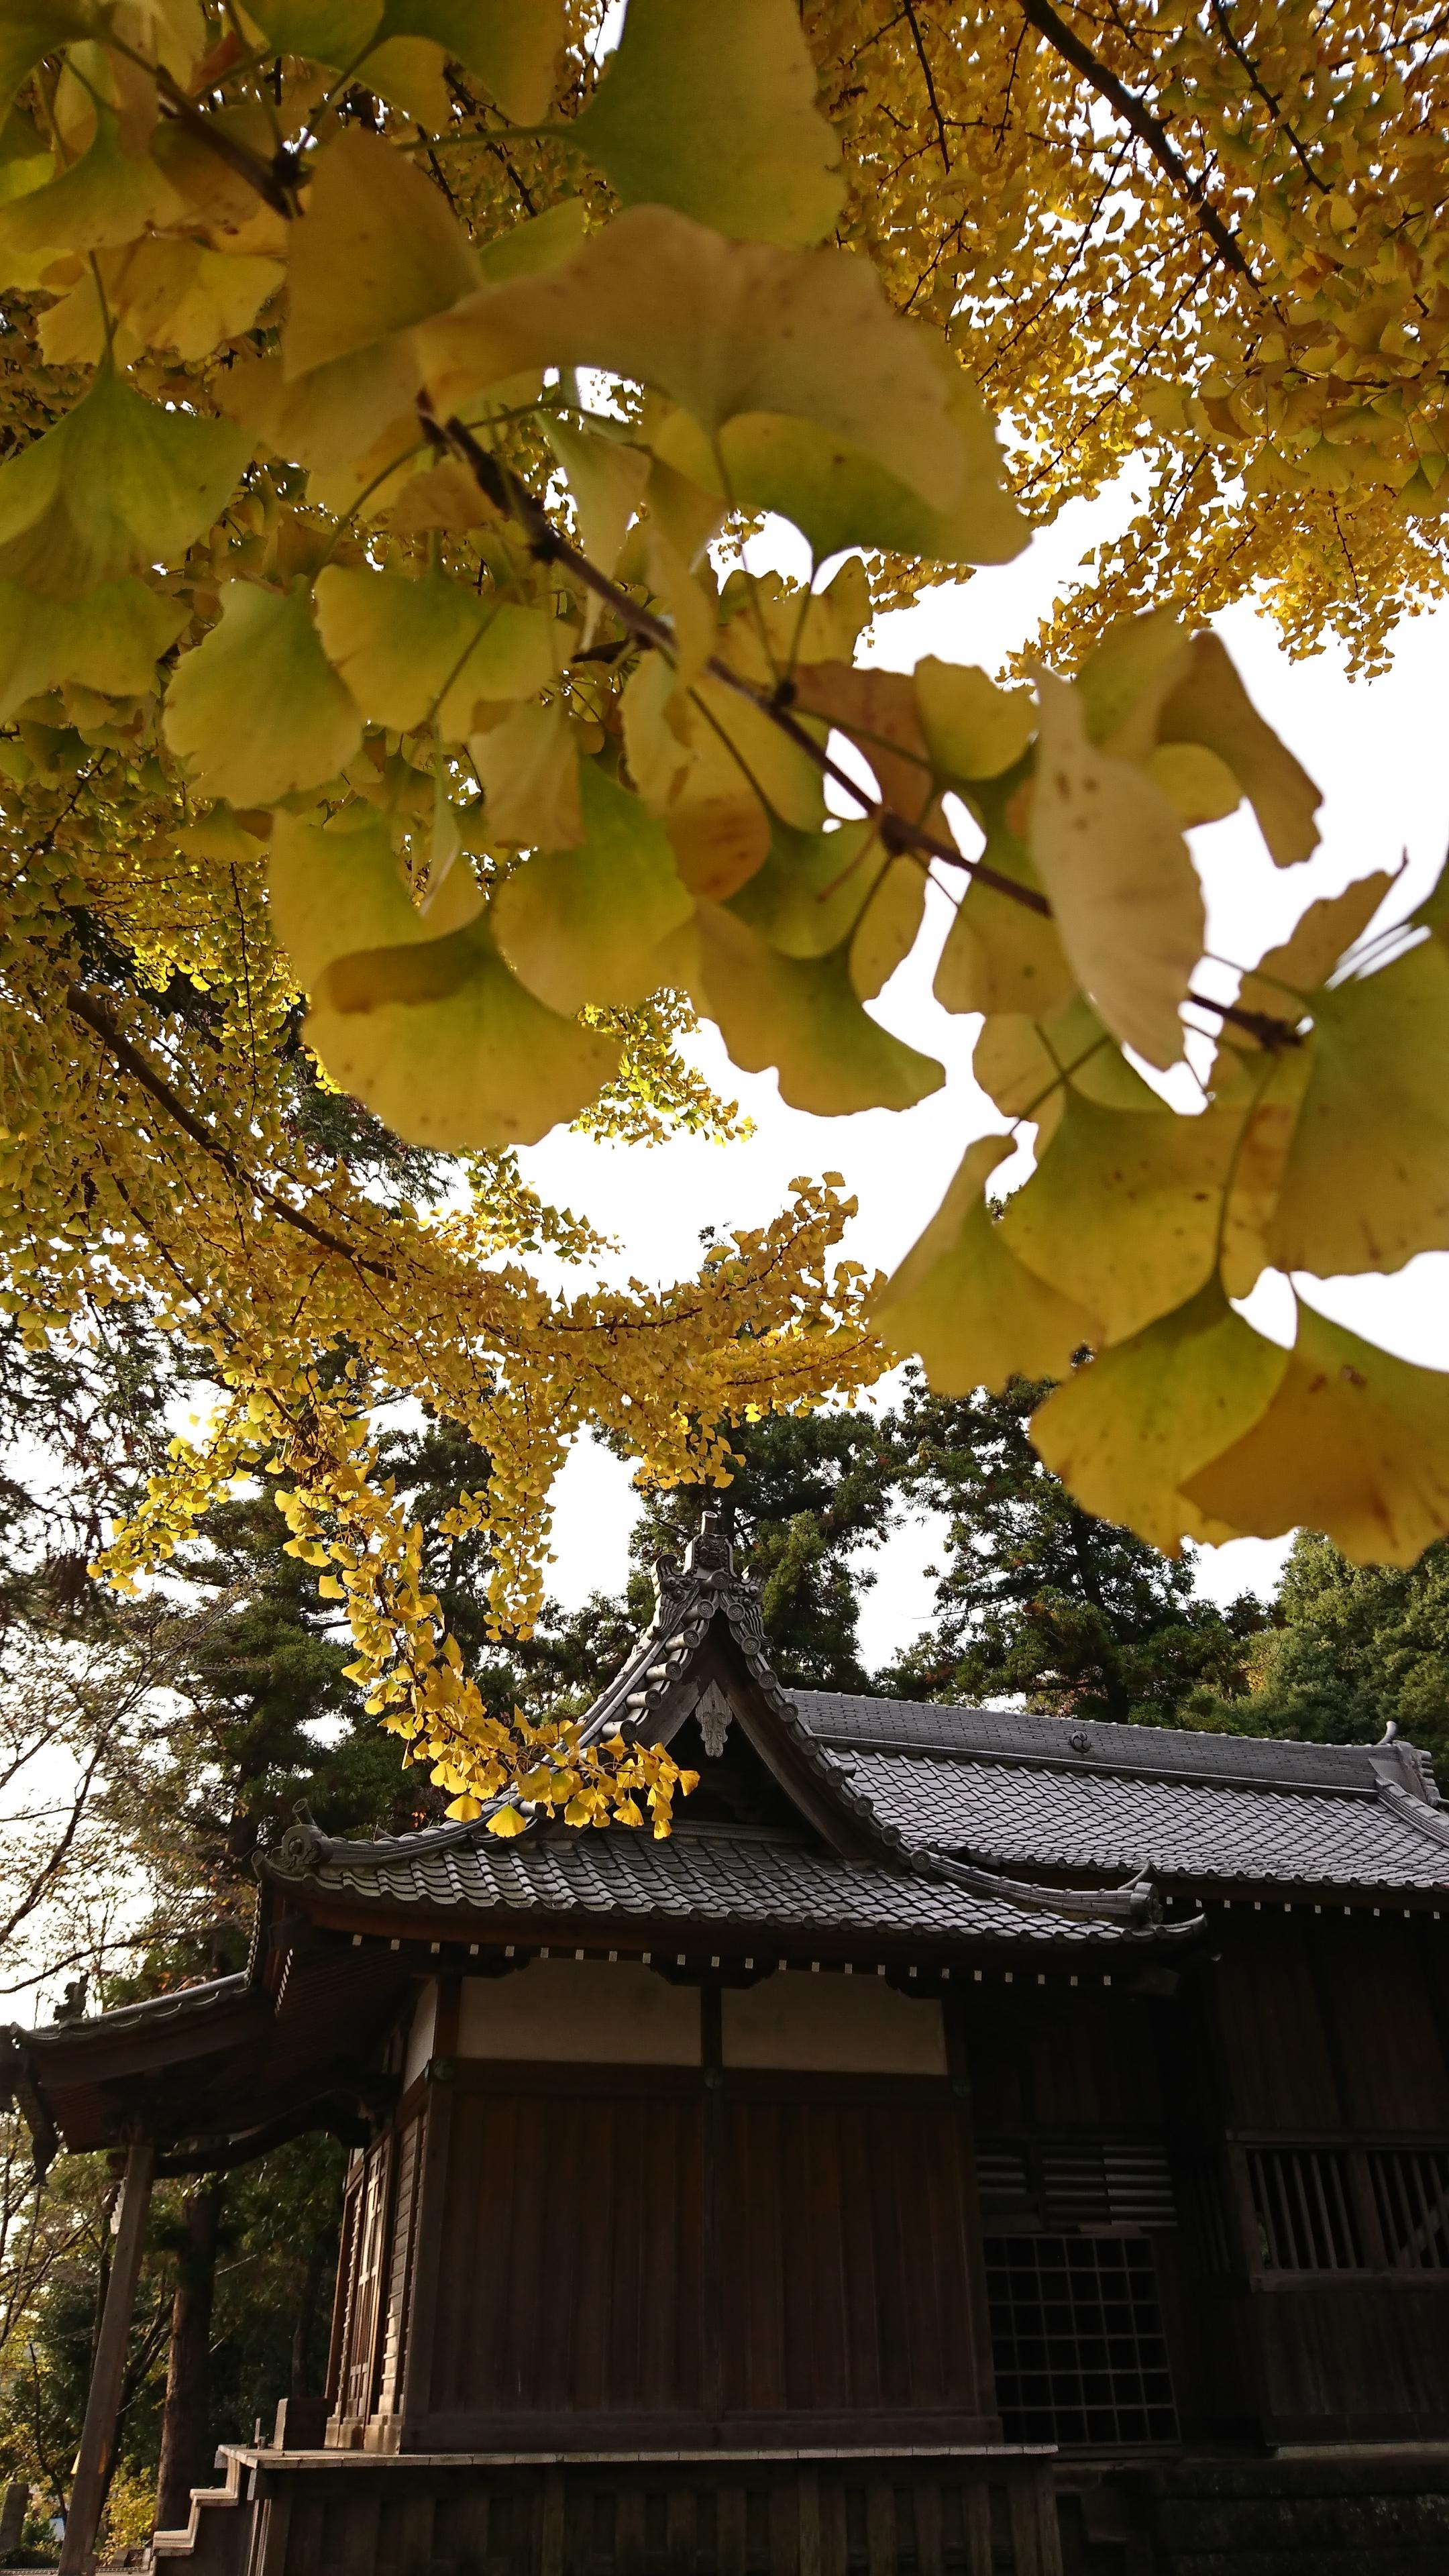 三柱神社の本殿